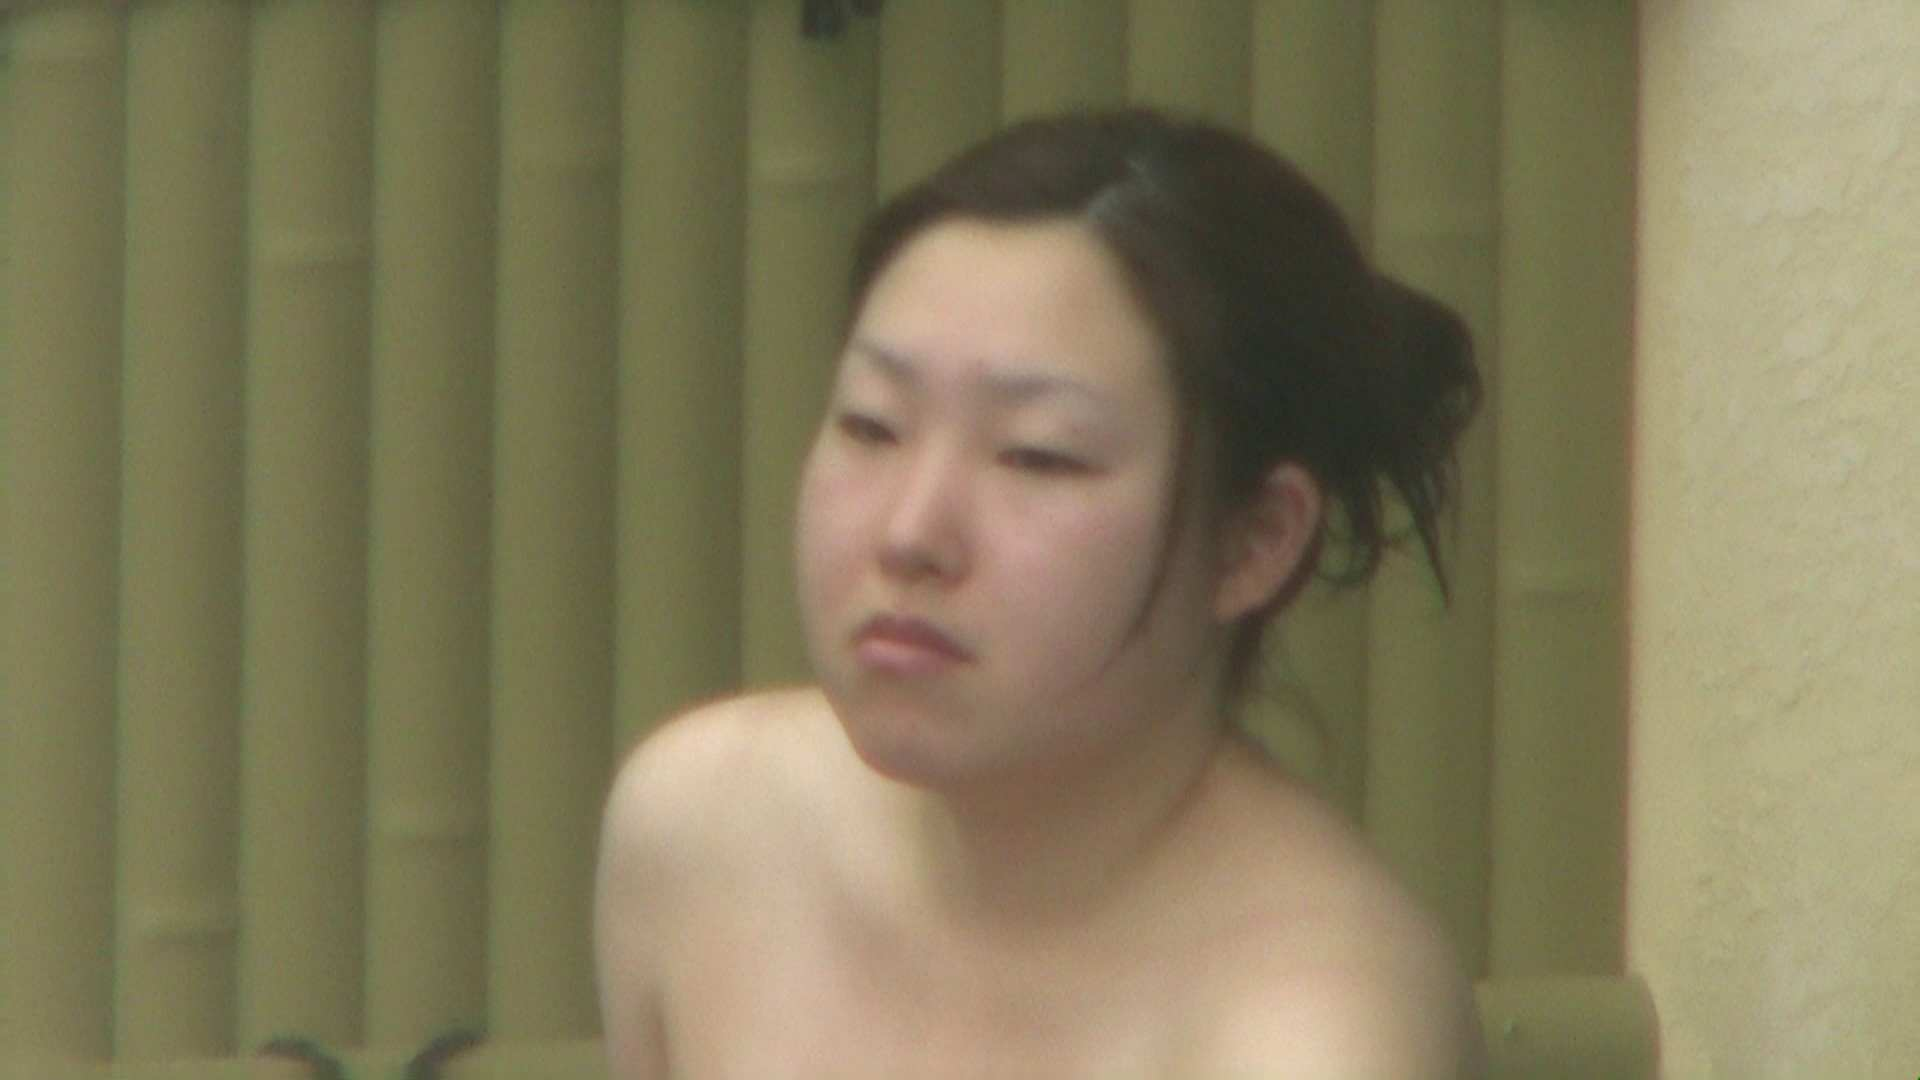 Aquaな露天風呂Vol.72【VIP限定】 露天風呂編  98PIX 74